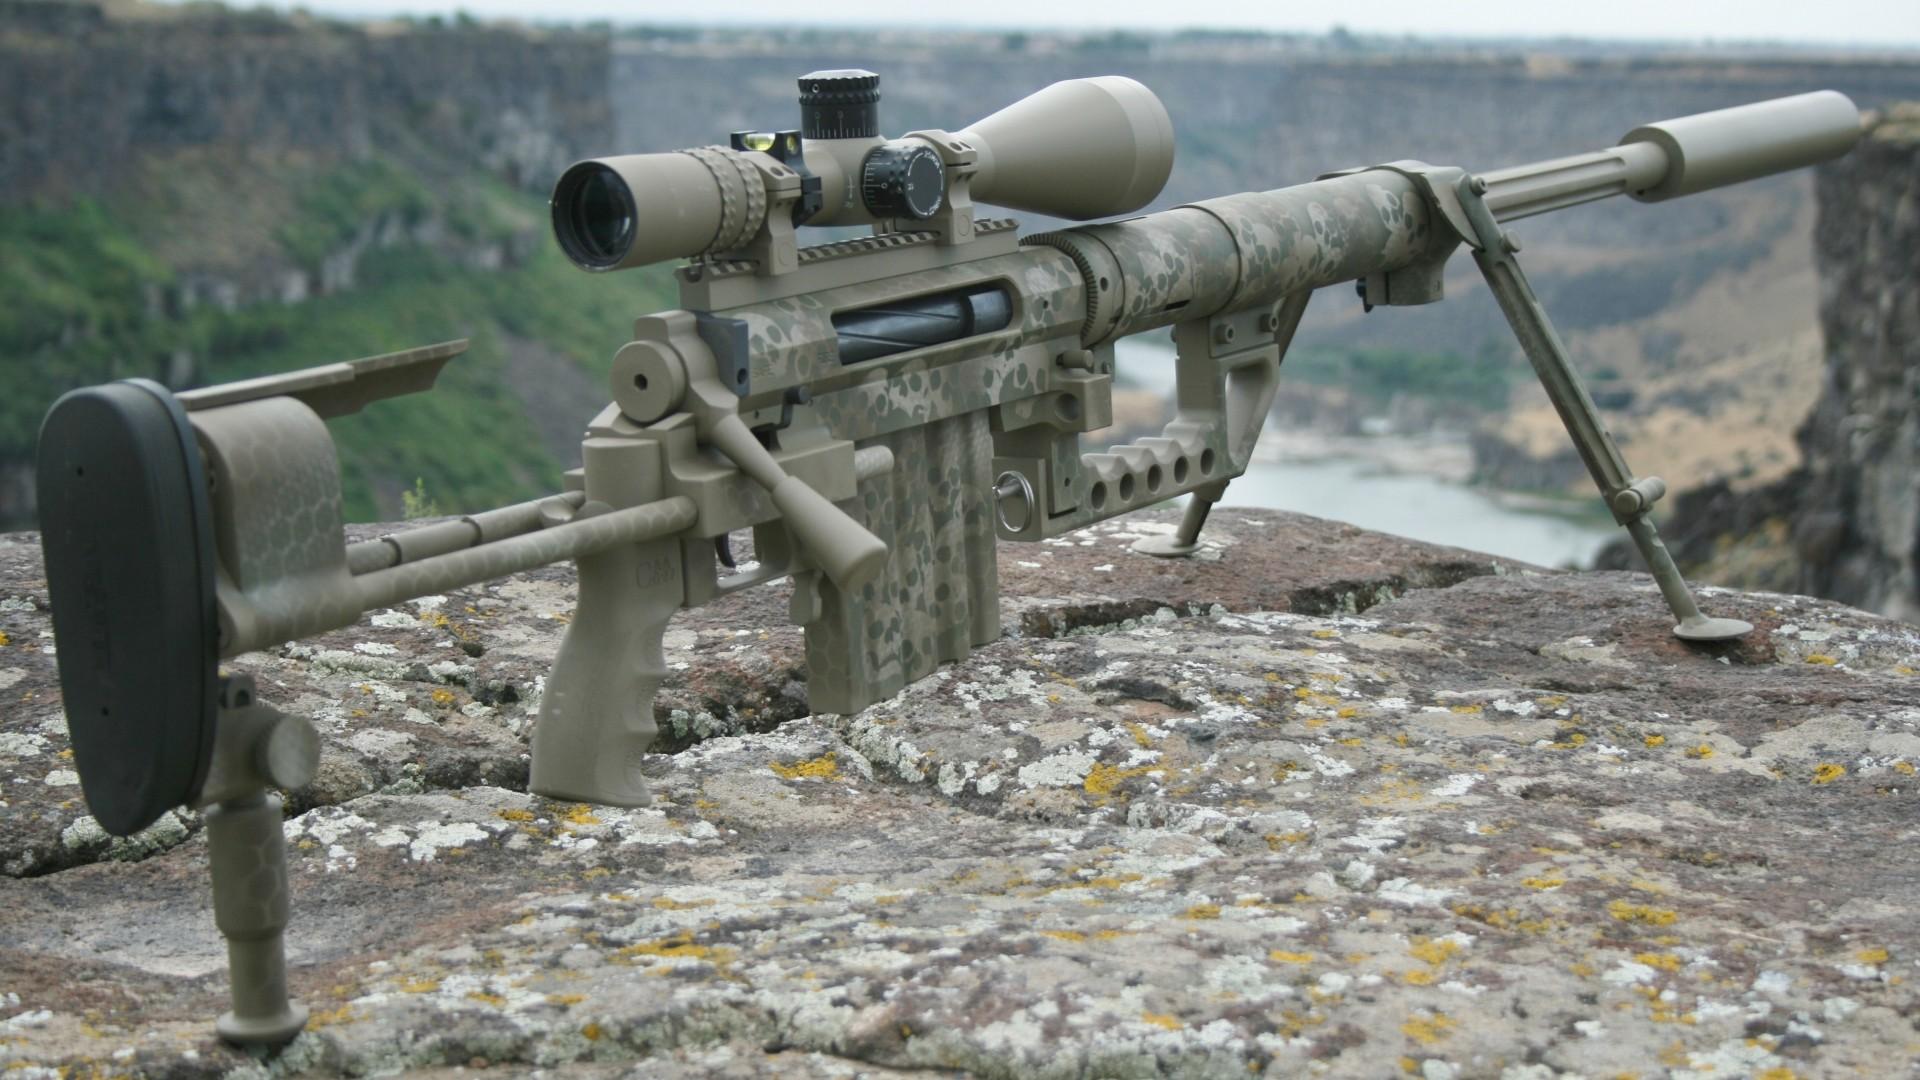 Pubg Wallpaper M24: 13 HD Sniper Rifle Guns Wallpapers